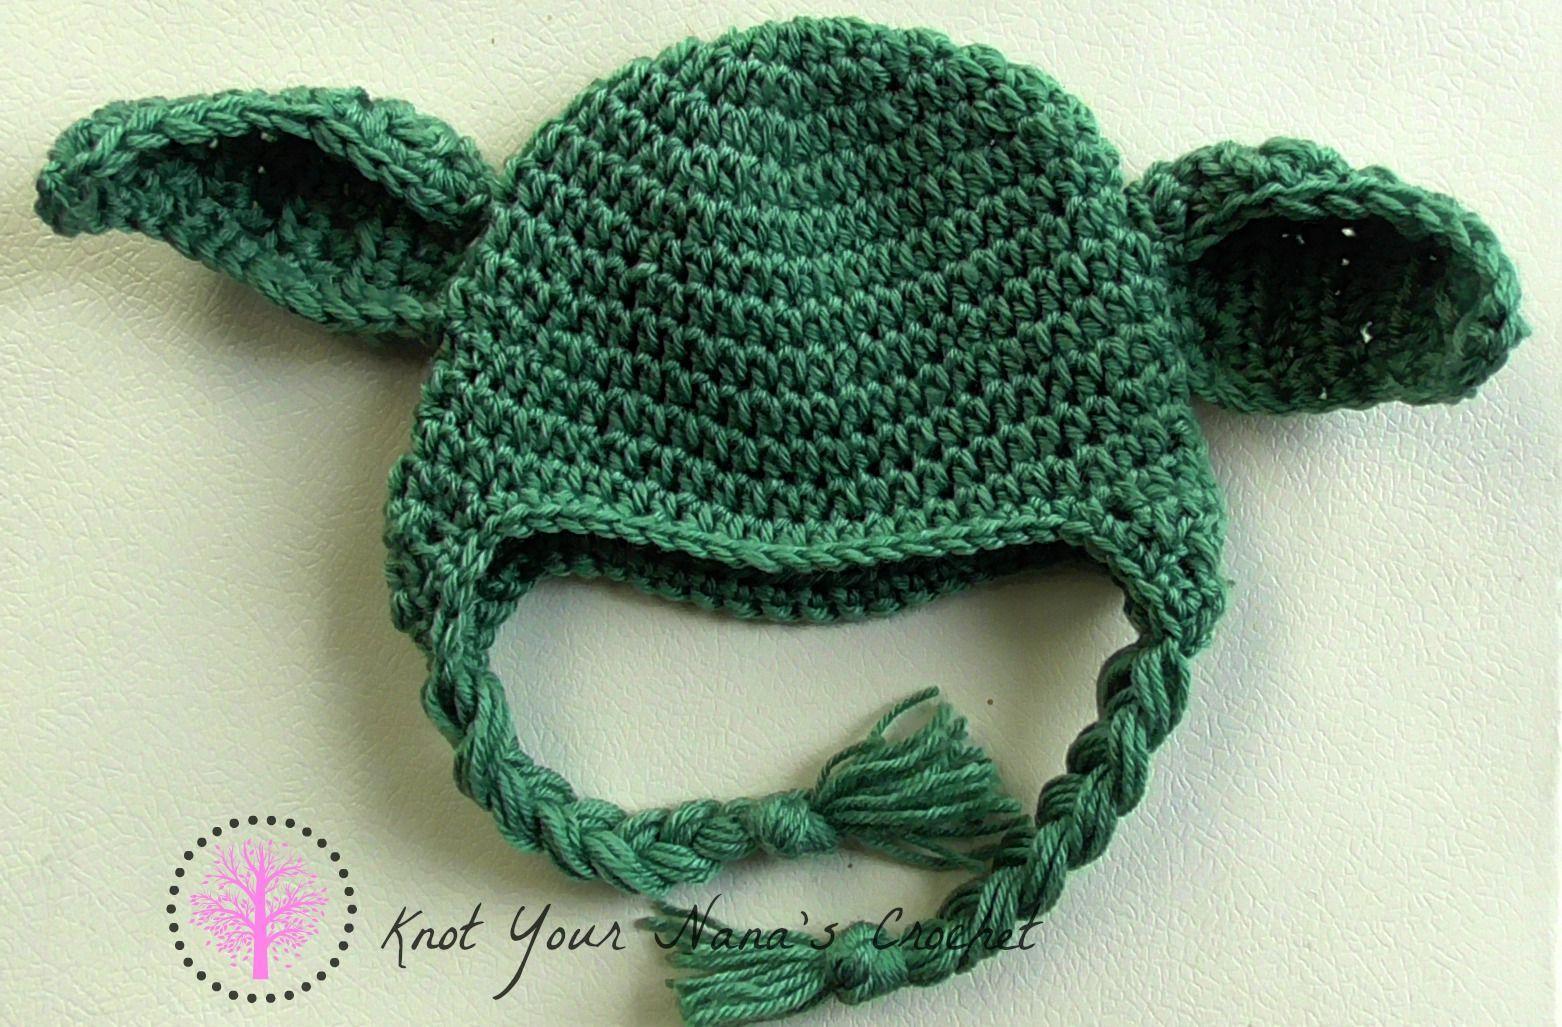 Knot Your Nana\'s Crochet: Crochet Yoda Hat   Knitting and Crochet ...